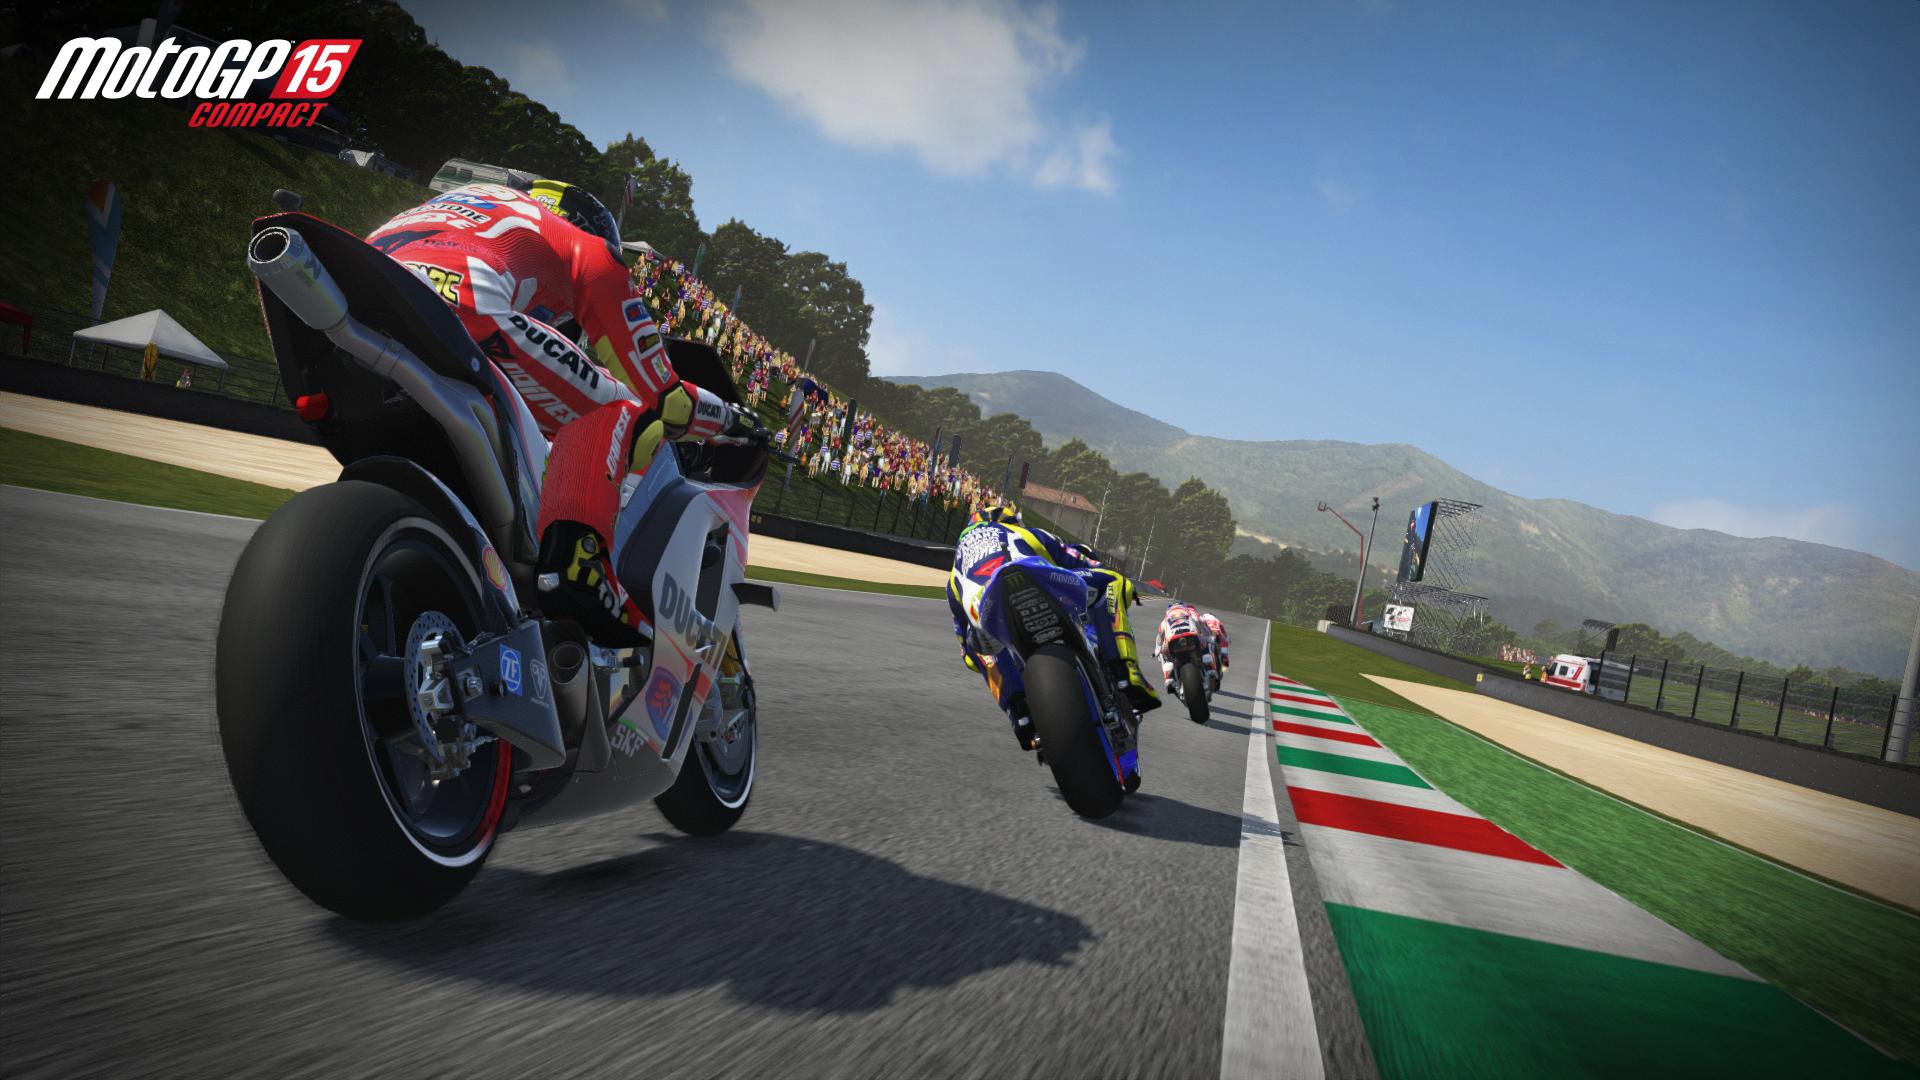 MotoGP15 Compact screenshot